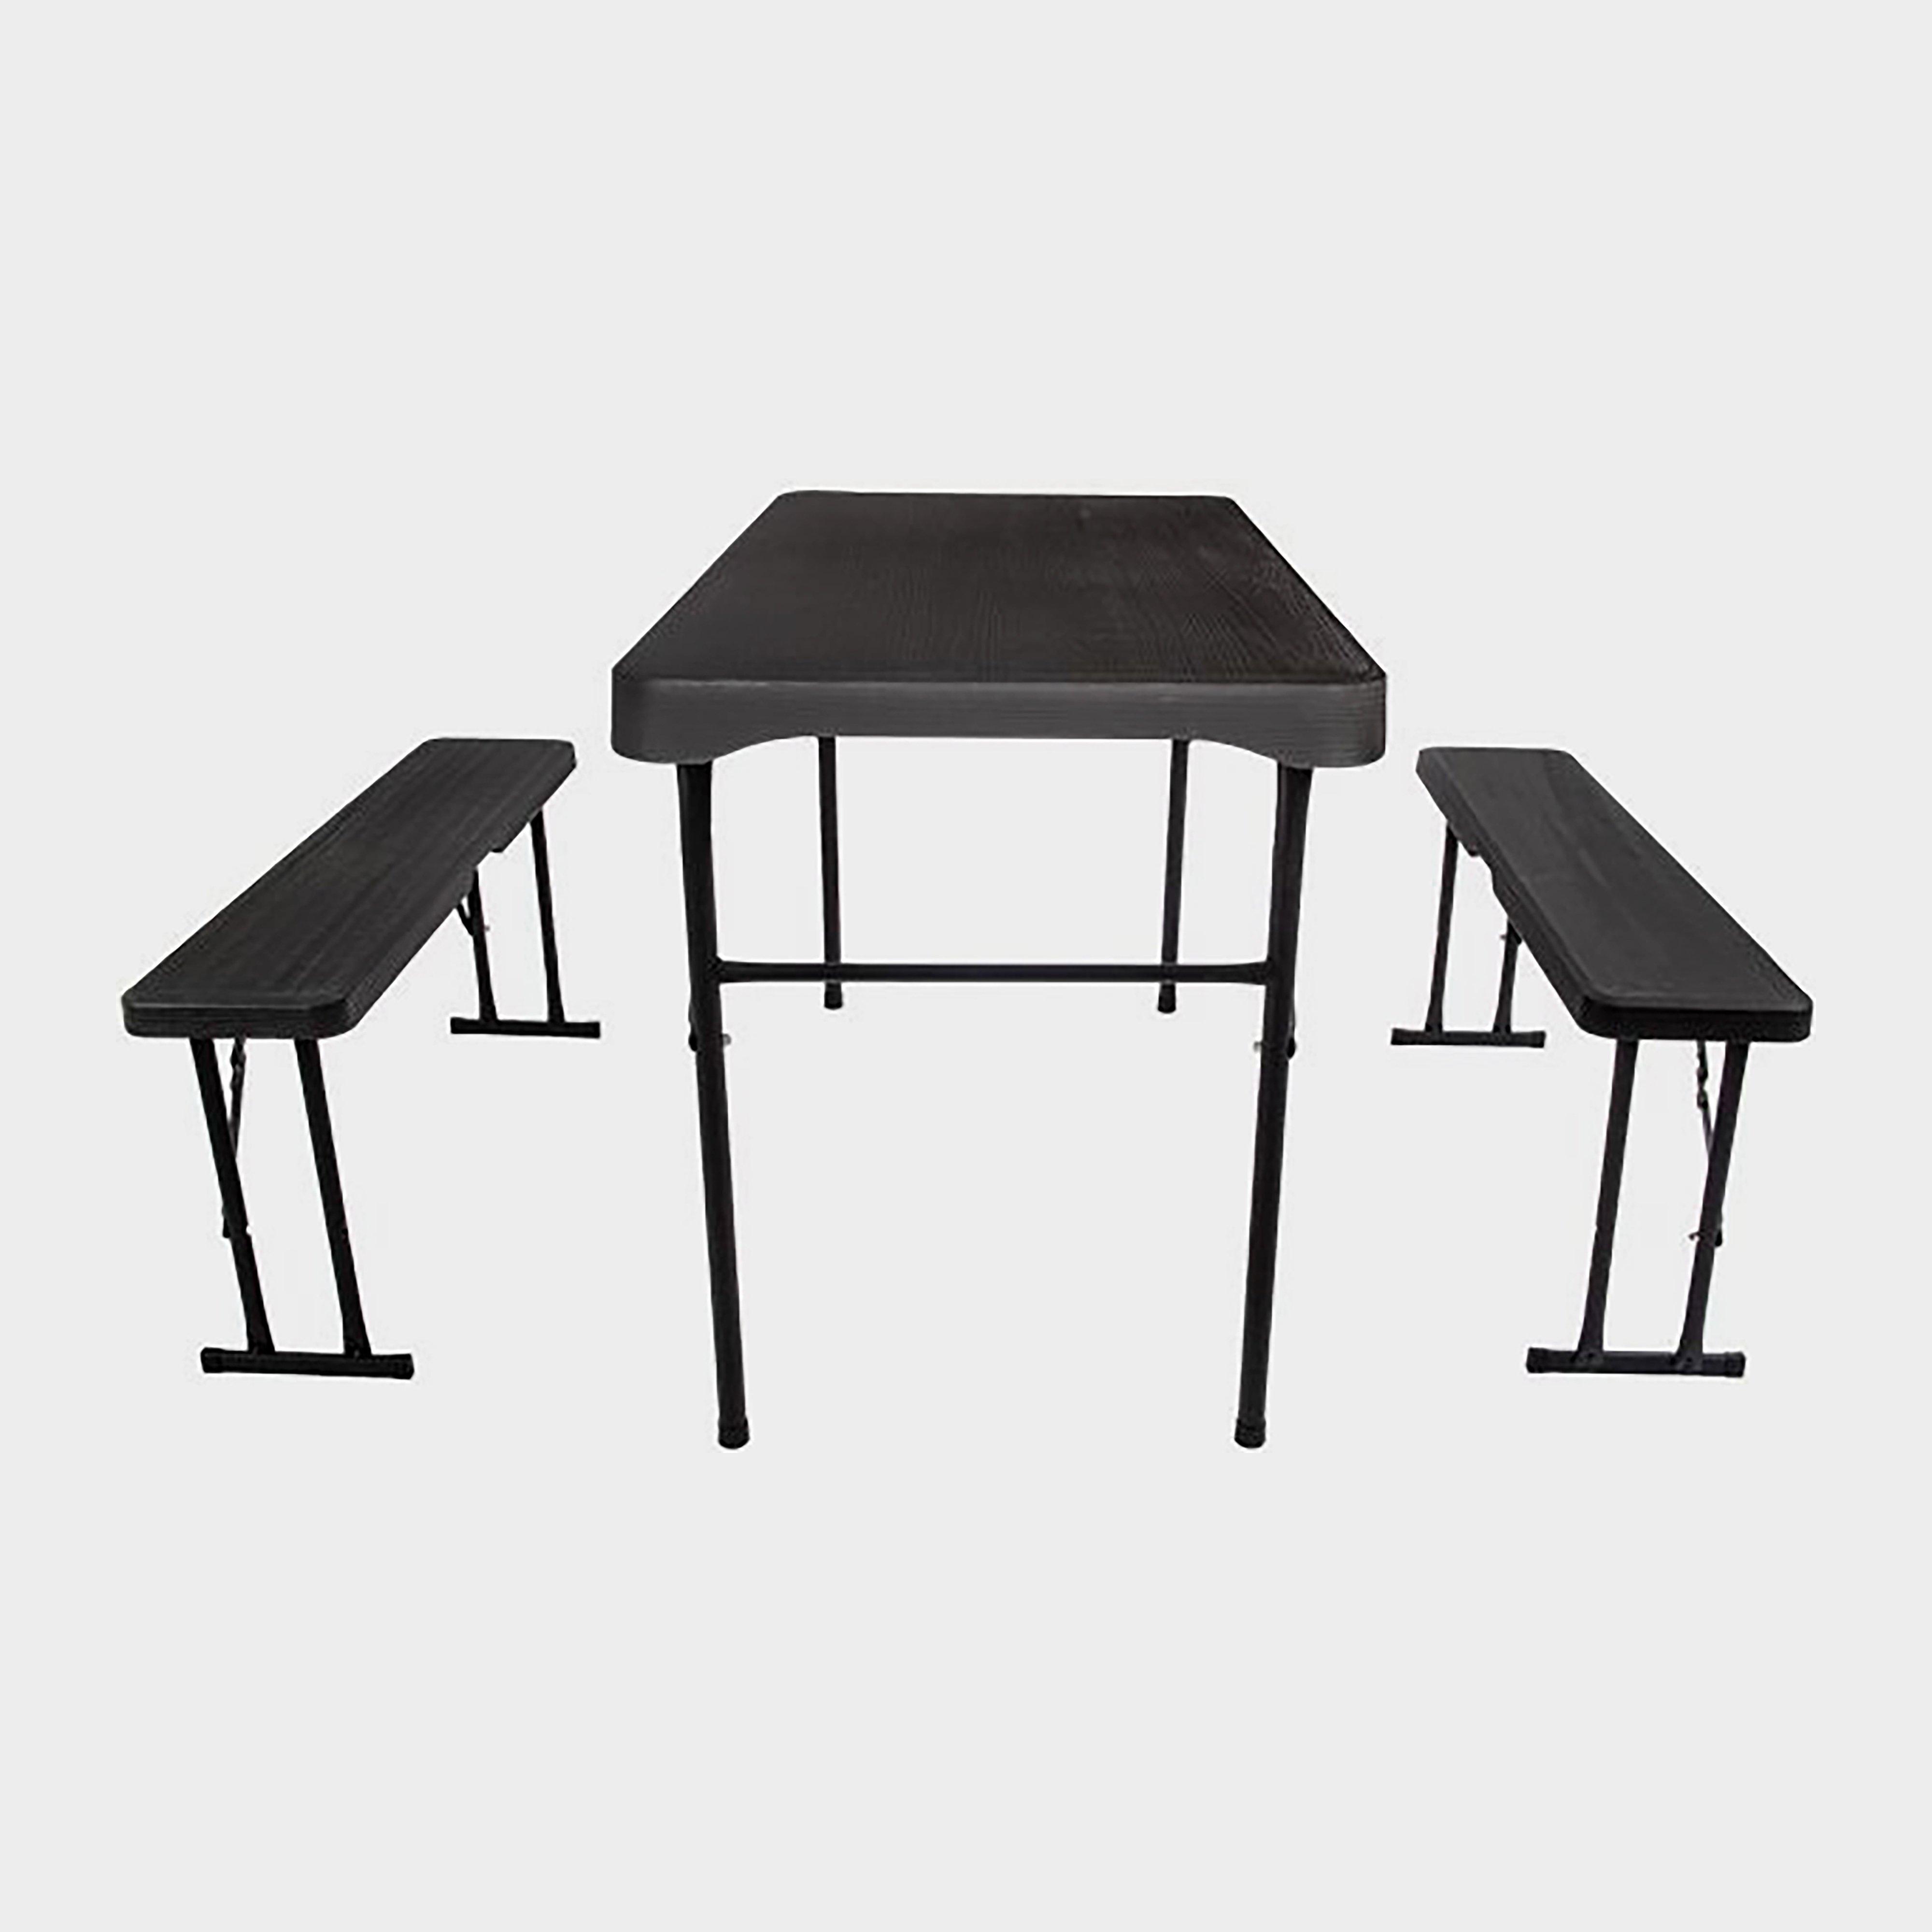 Quest Jet Stream Grassmoor Table And Bench Set - Black/Set, Black